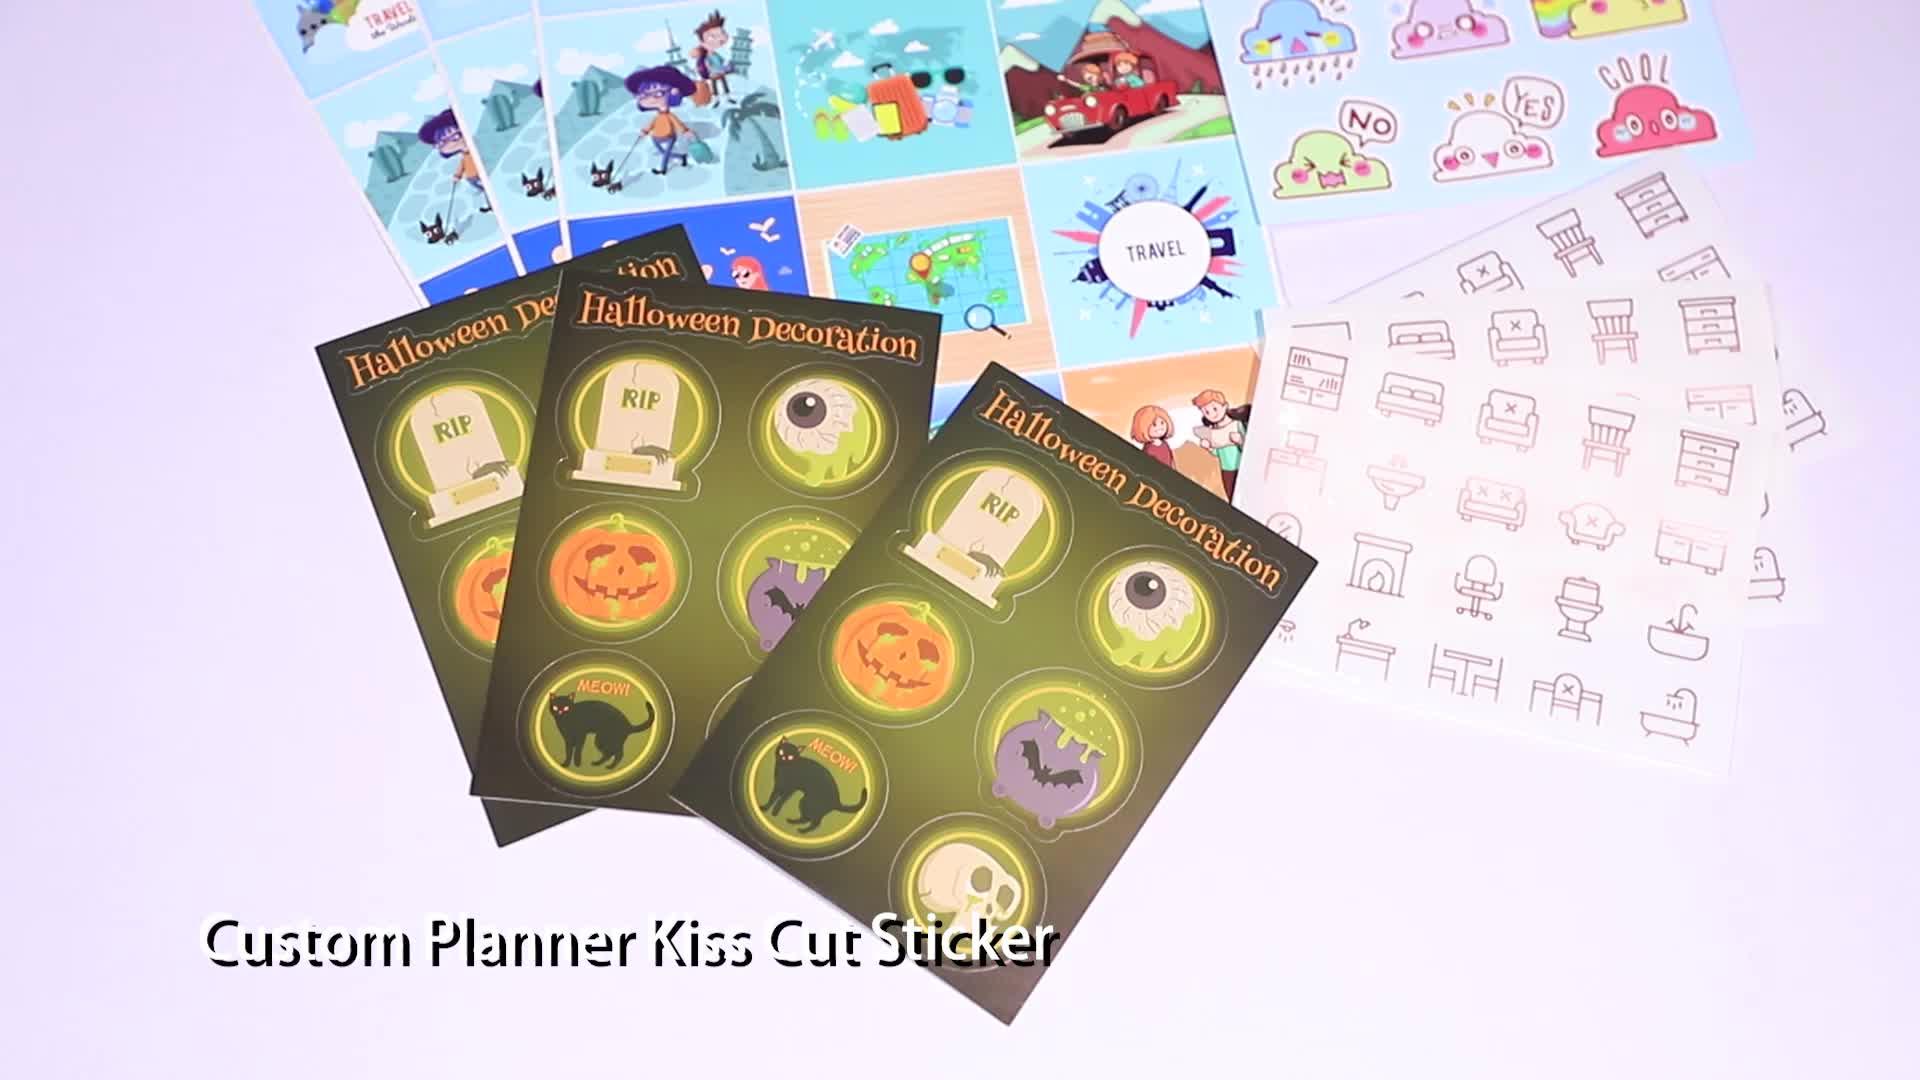 Adhesive Paper Kiss Cut Cartoon Promotional Custom Sticker Sheet